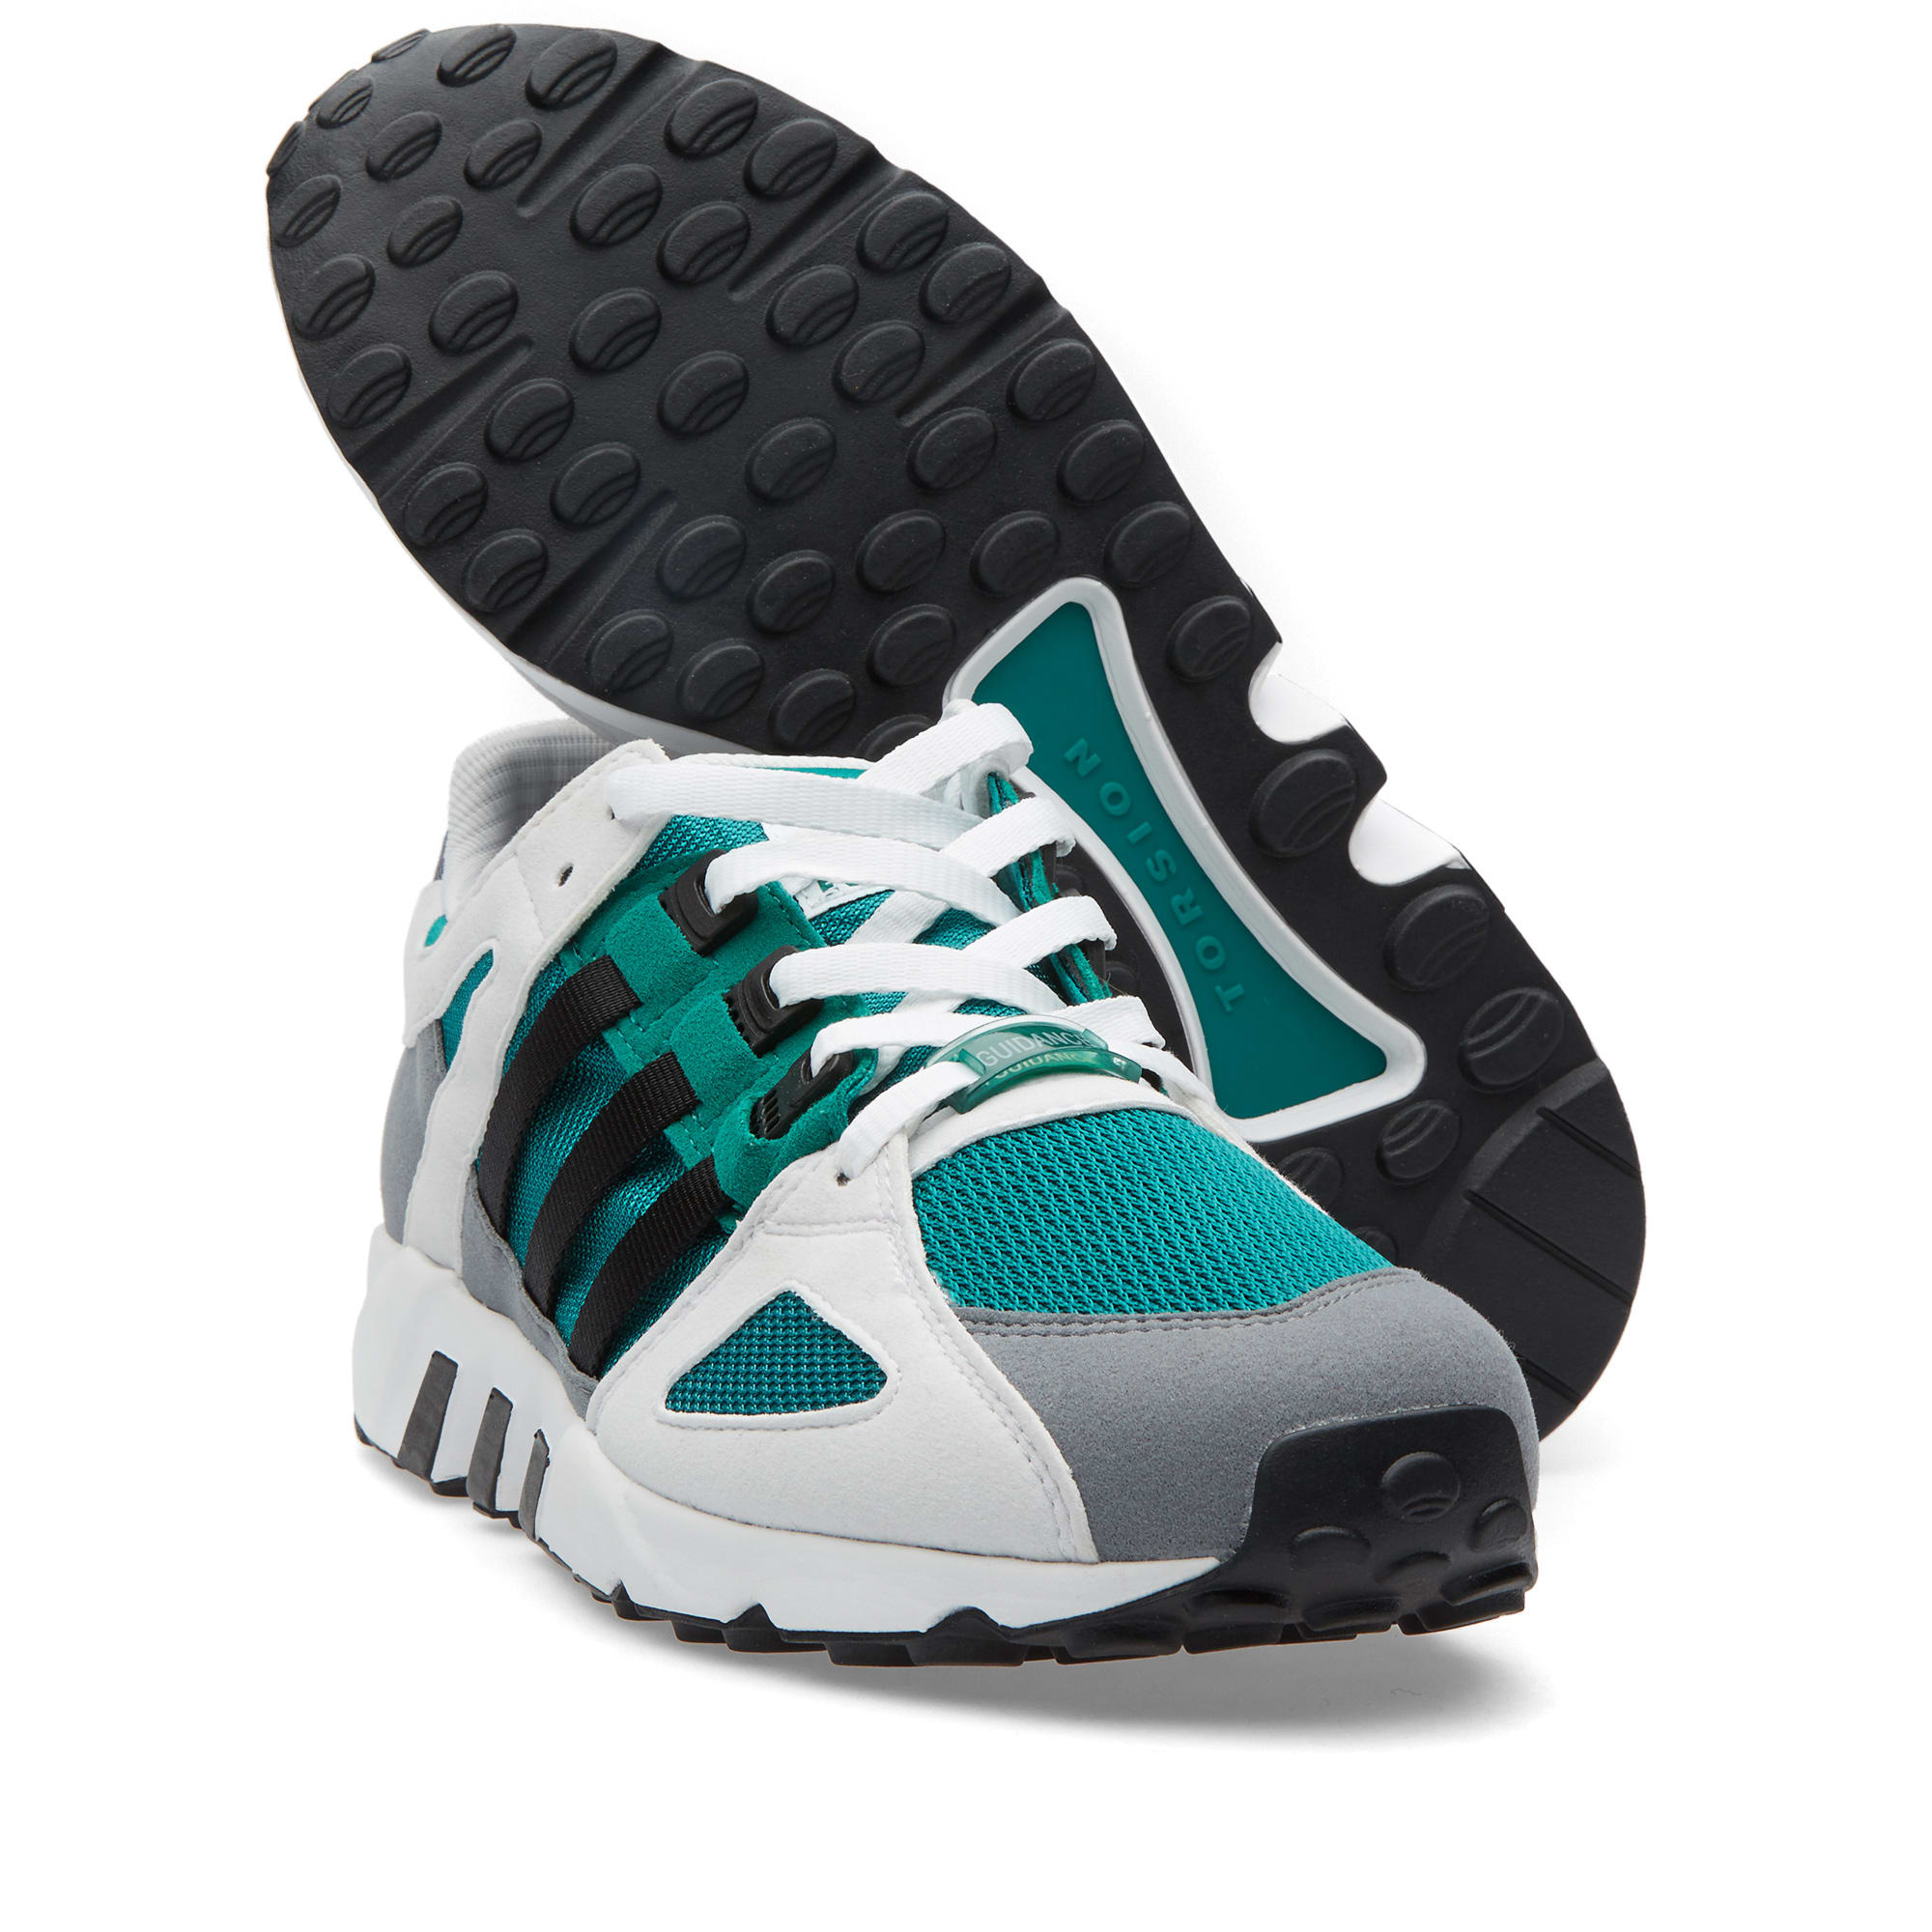 low priced 8da98 4bdd9 Adidas EQT Running Guidance '93